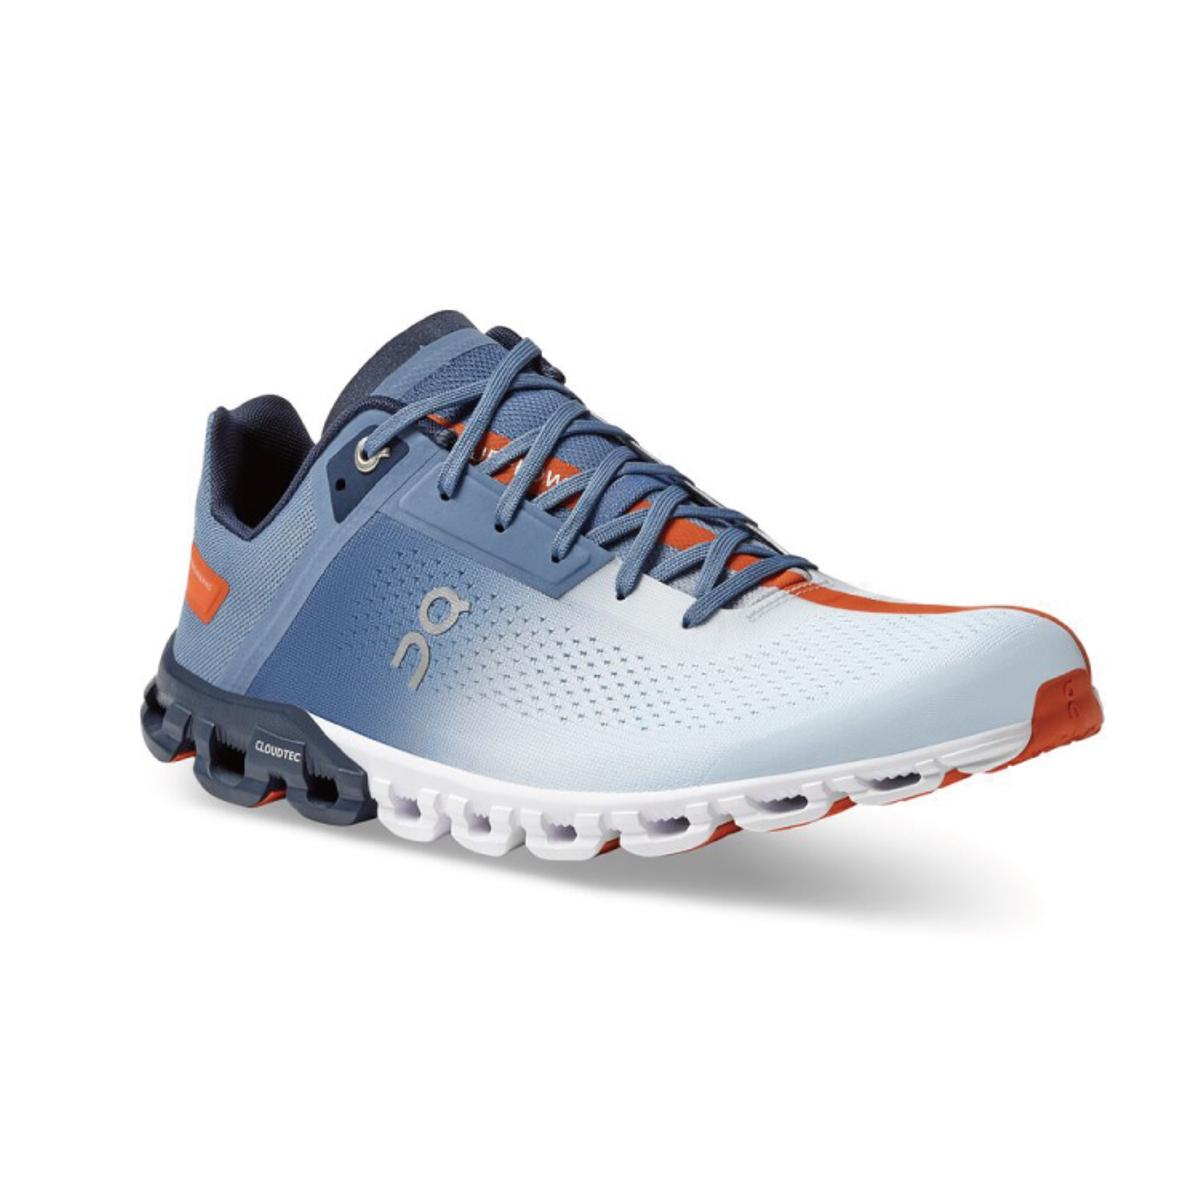 Men's On Cloudflow 3.0 Running Shoe - Color: Lake/Flare - Size: 7 - Width: Regular, Lake/Flare, large, image 5